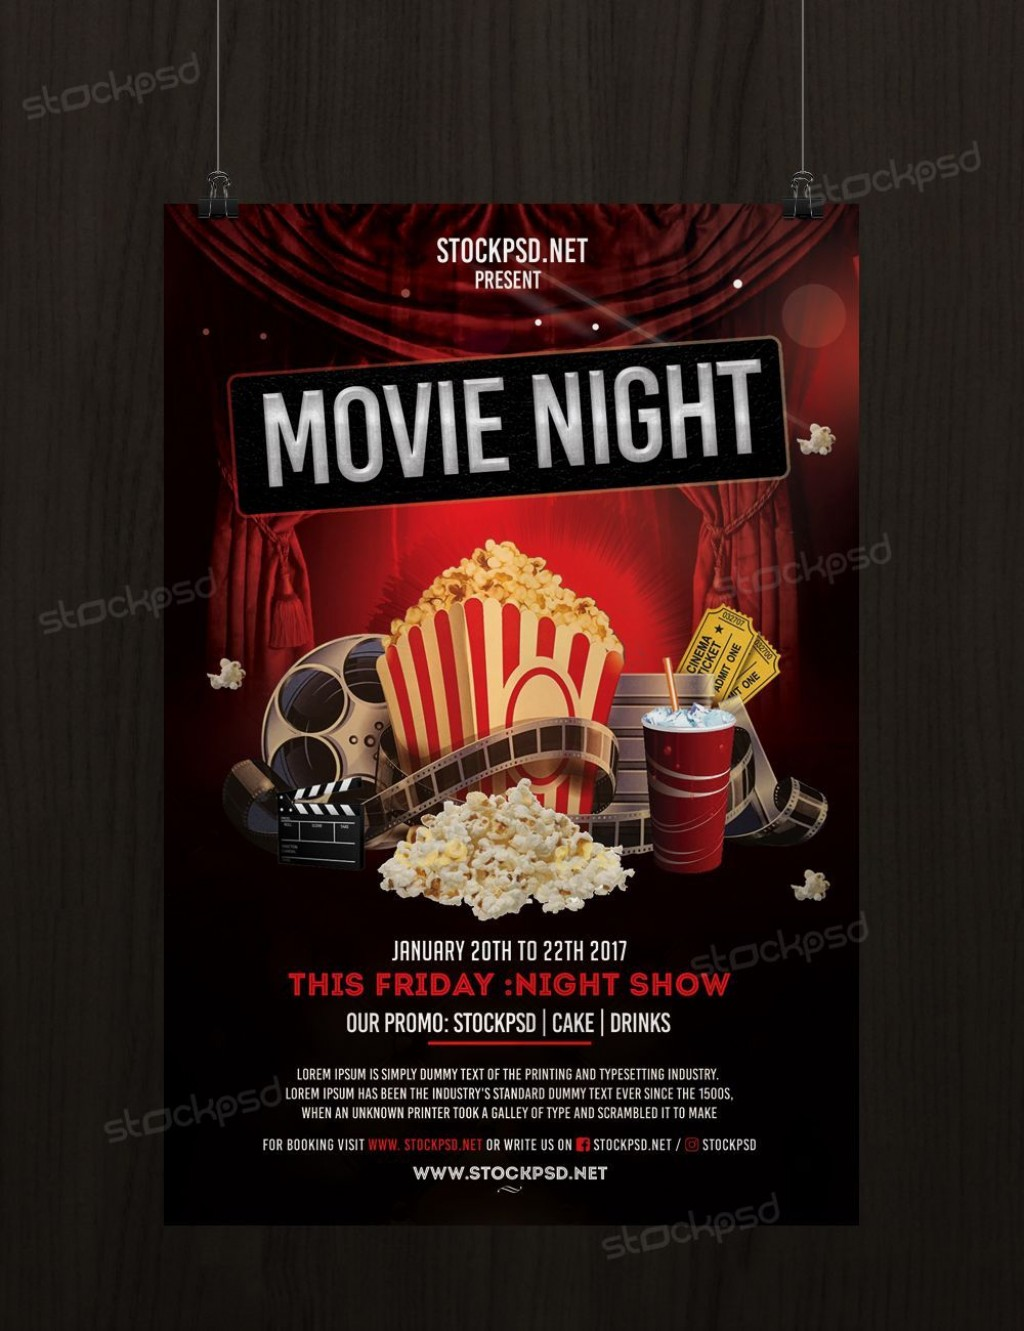 006 Rare Movie Night Flyer Template Inspiration  Editable Psd FreeLarge